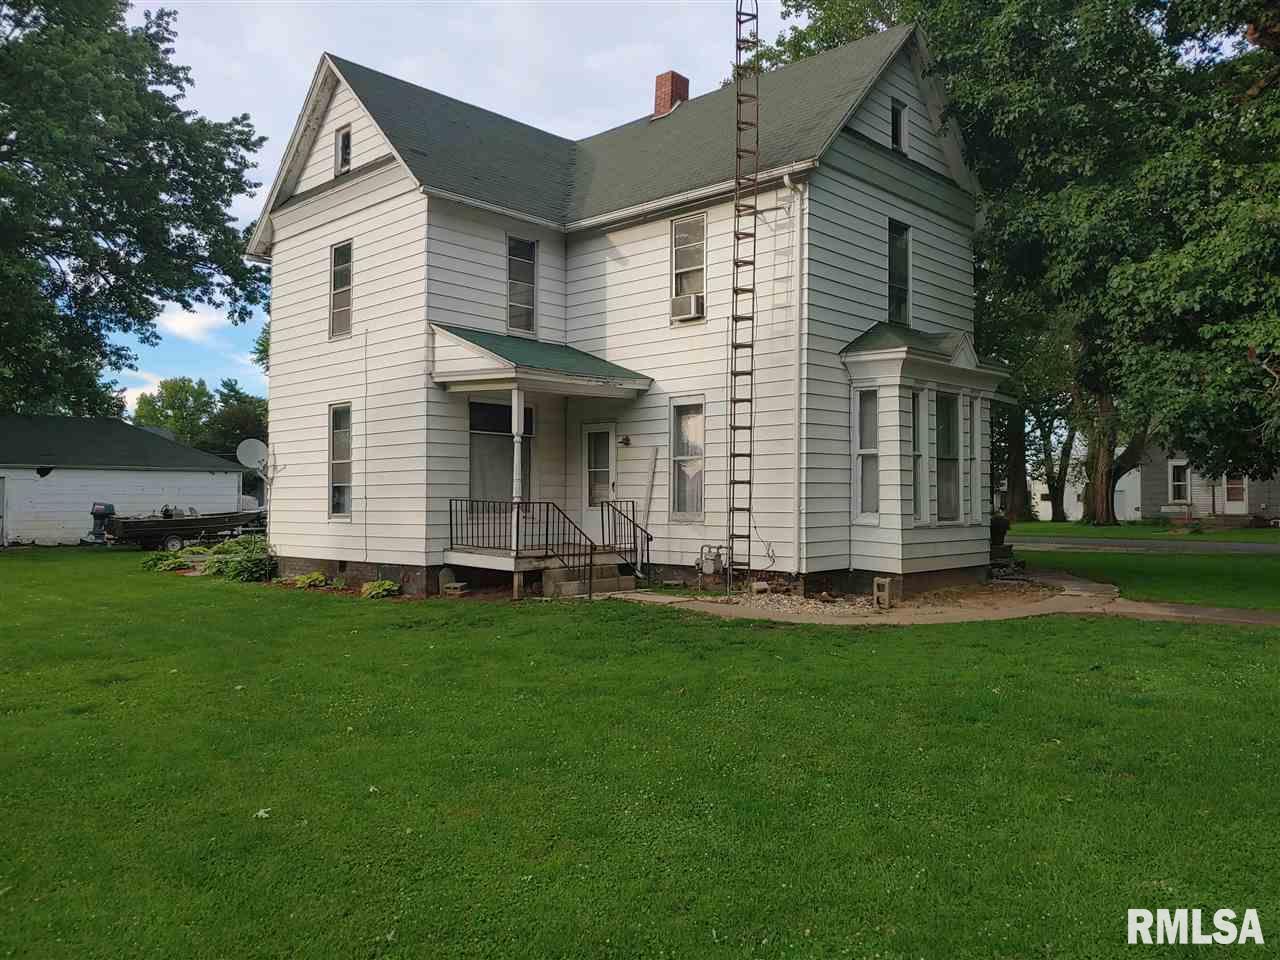 630 E ADAMS Property Photo - Blandinsville, IL real estate listing